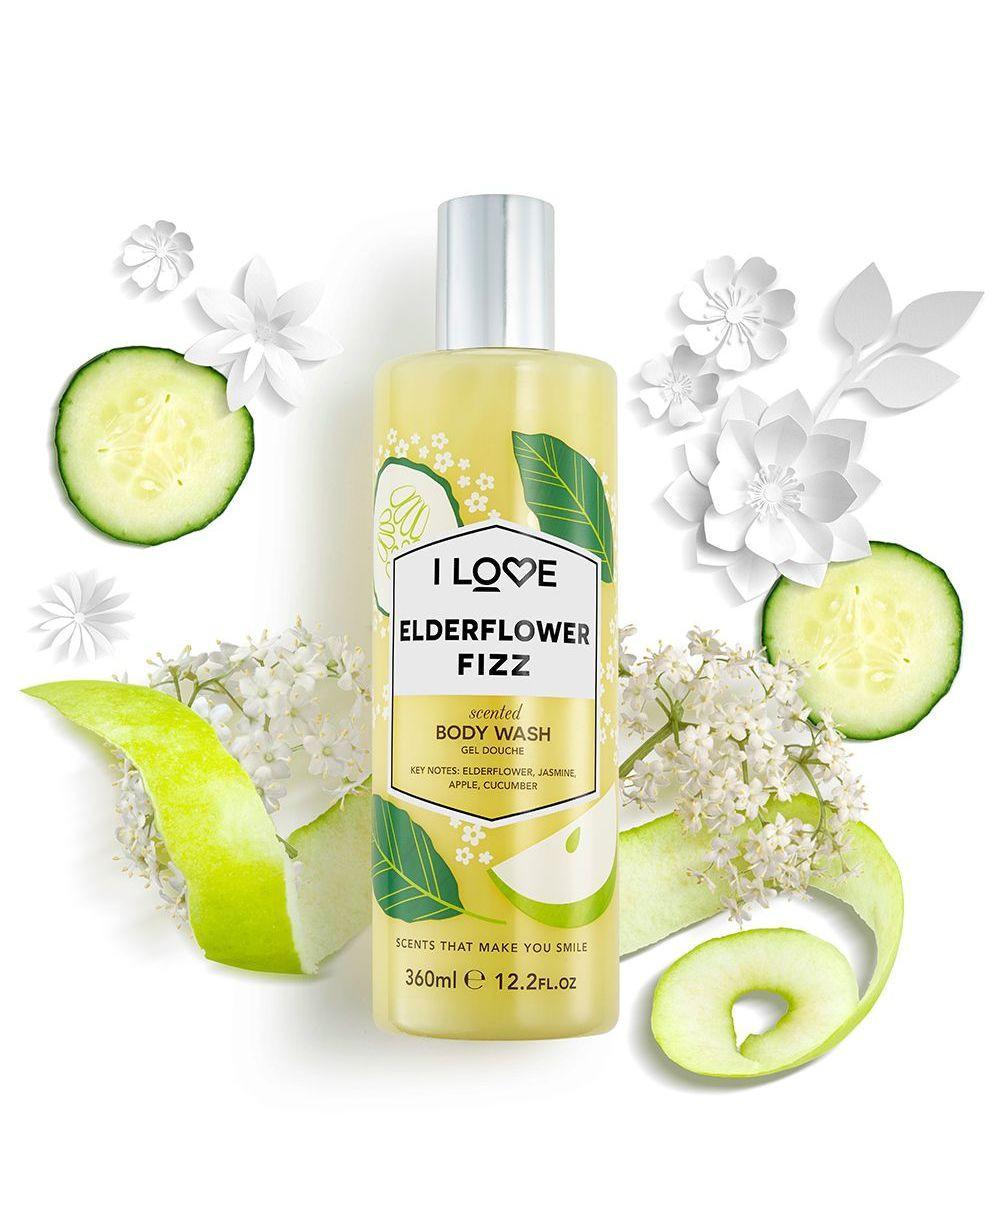 I Love Body Wash Elderflower Fizz 360ml